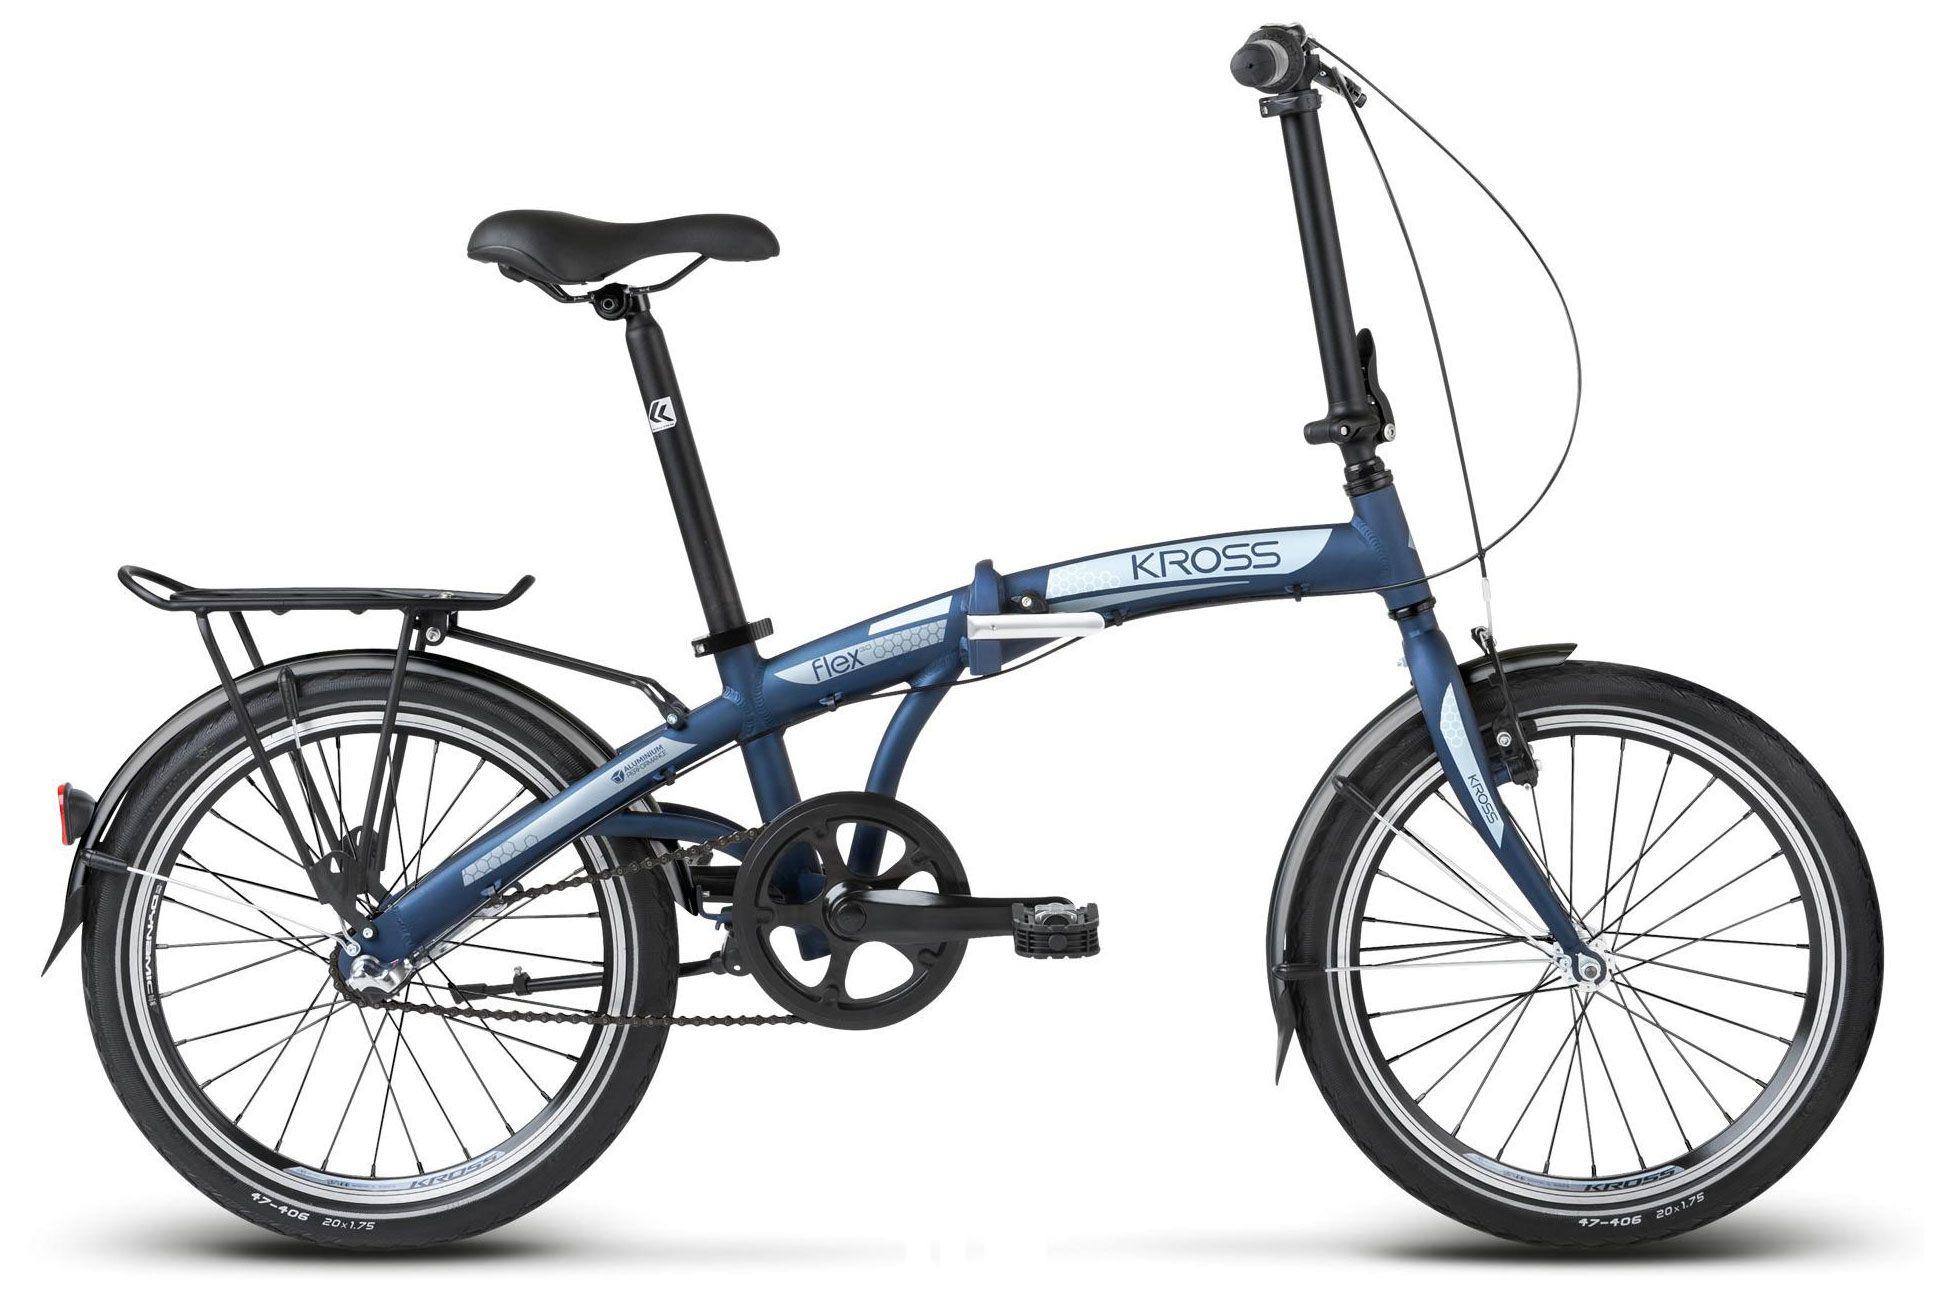 Велосипед KROSS FLEX 3.0 2017 велосипед kross flex 2 0 2015